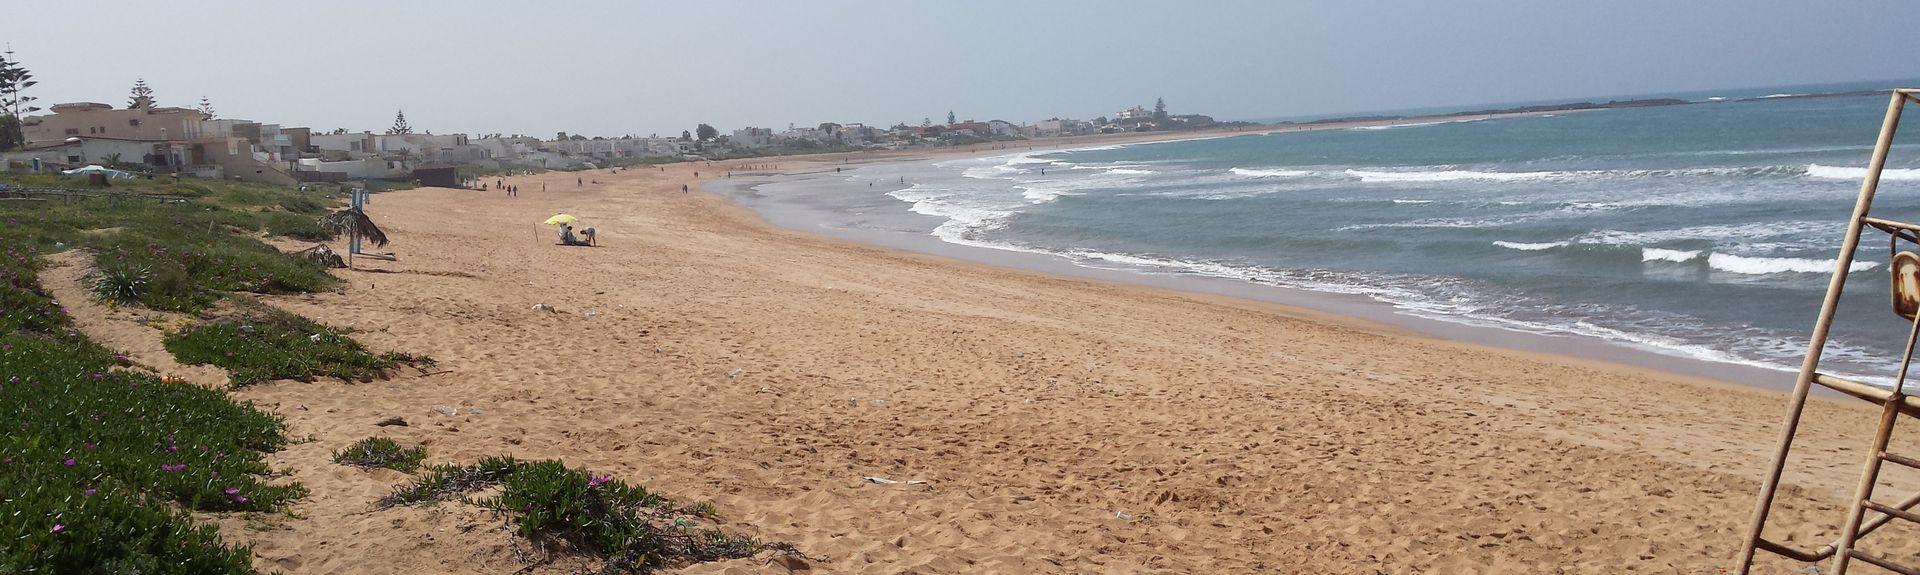 Skhirat, Morocco